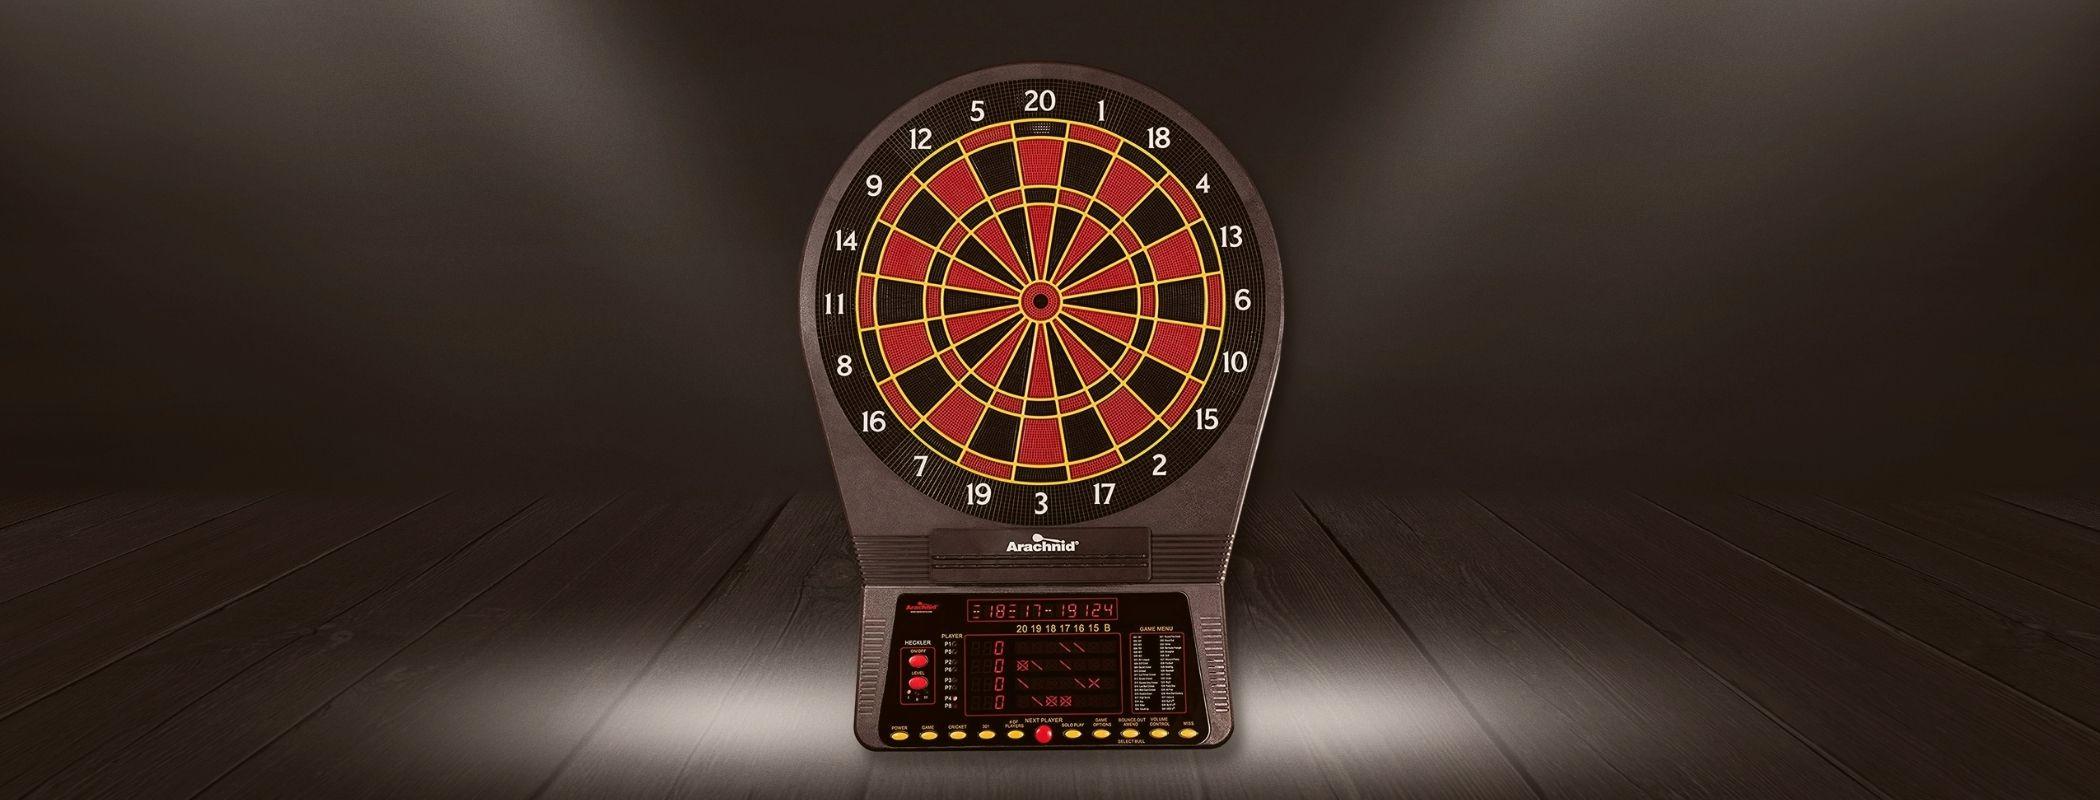 Arachnid Cricket Pro 800 Electronic Dartboard (1)